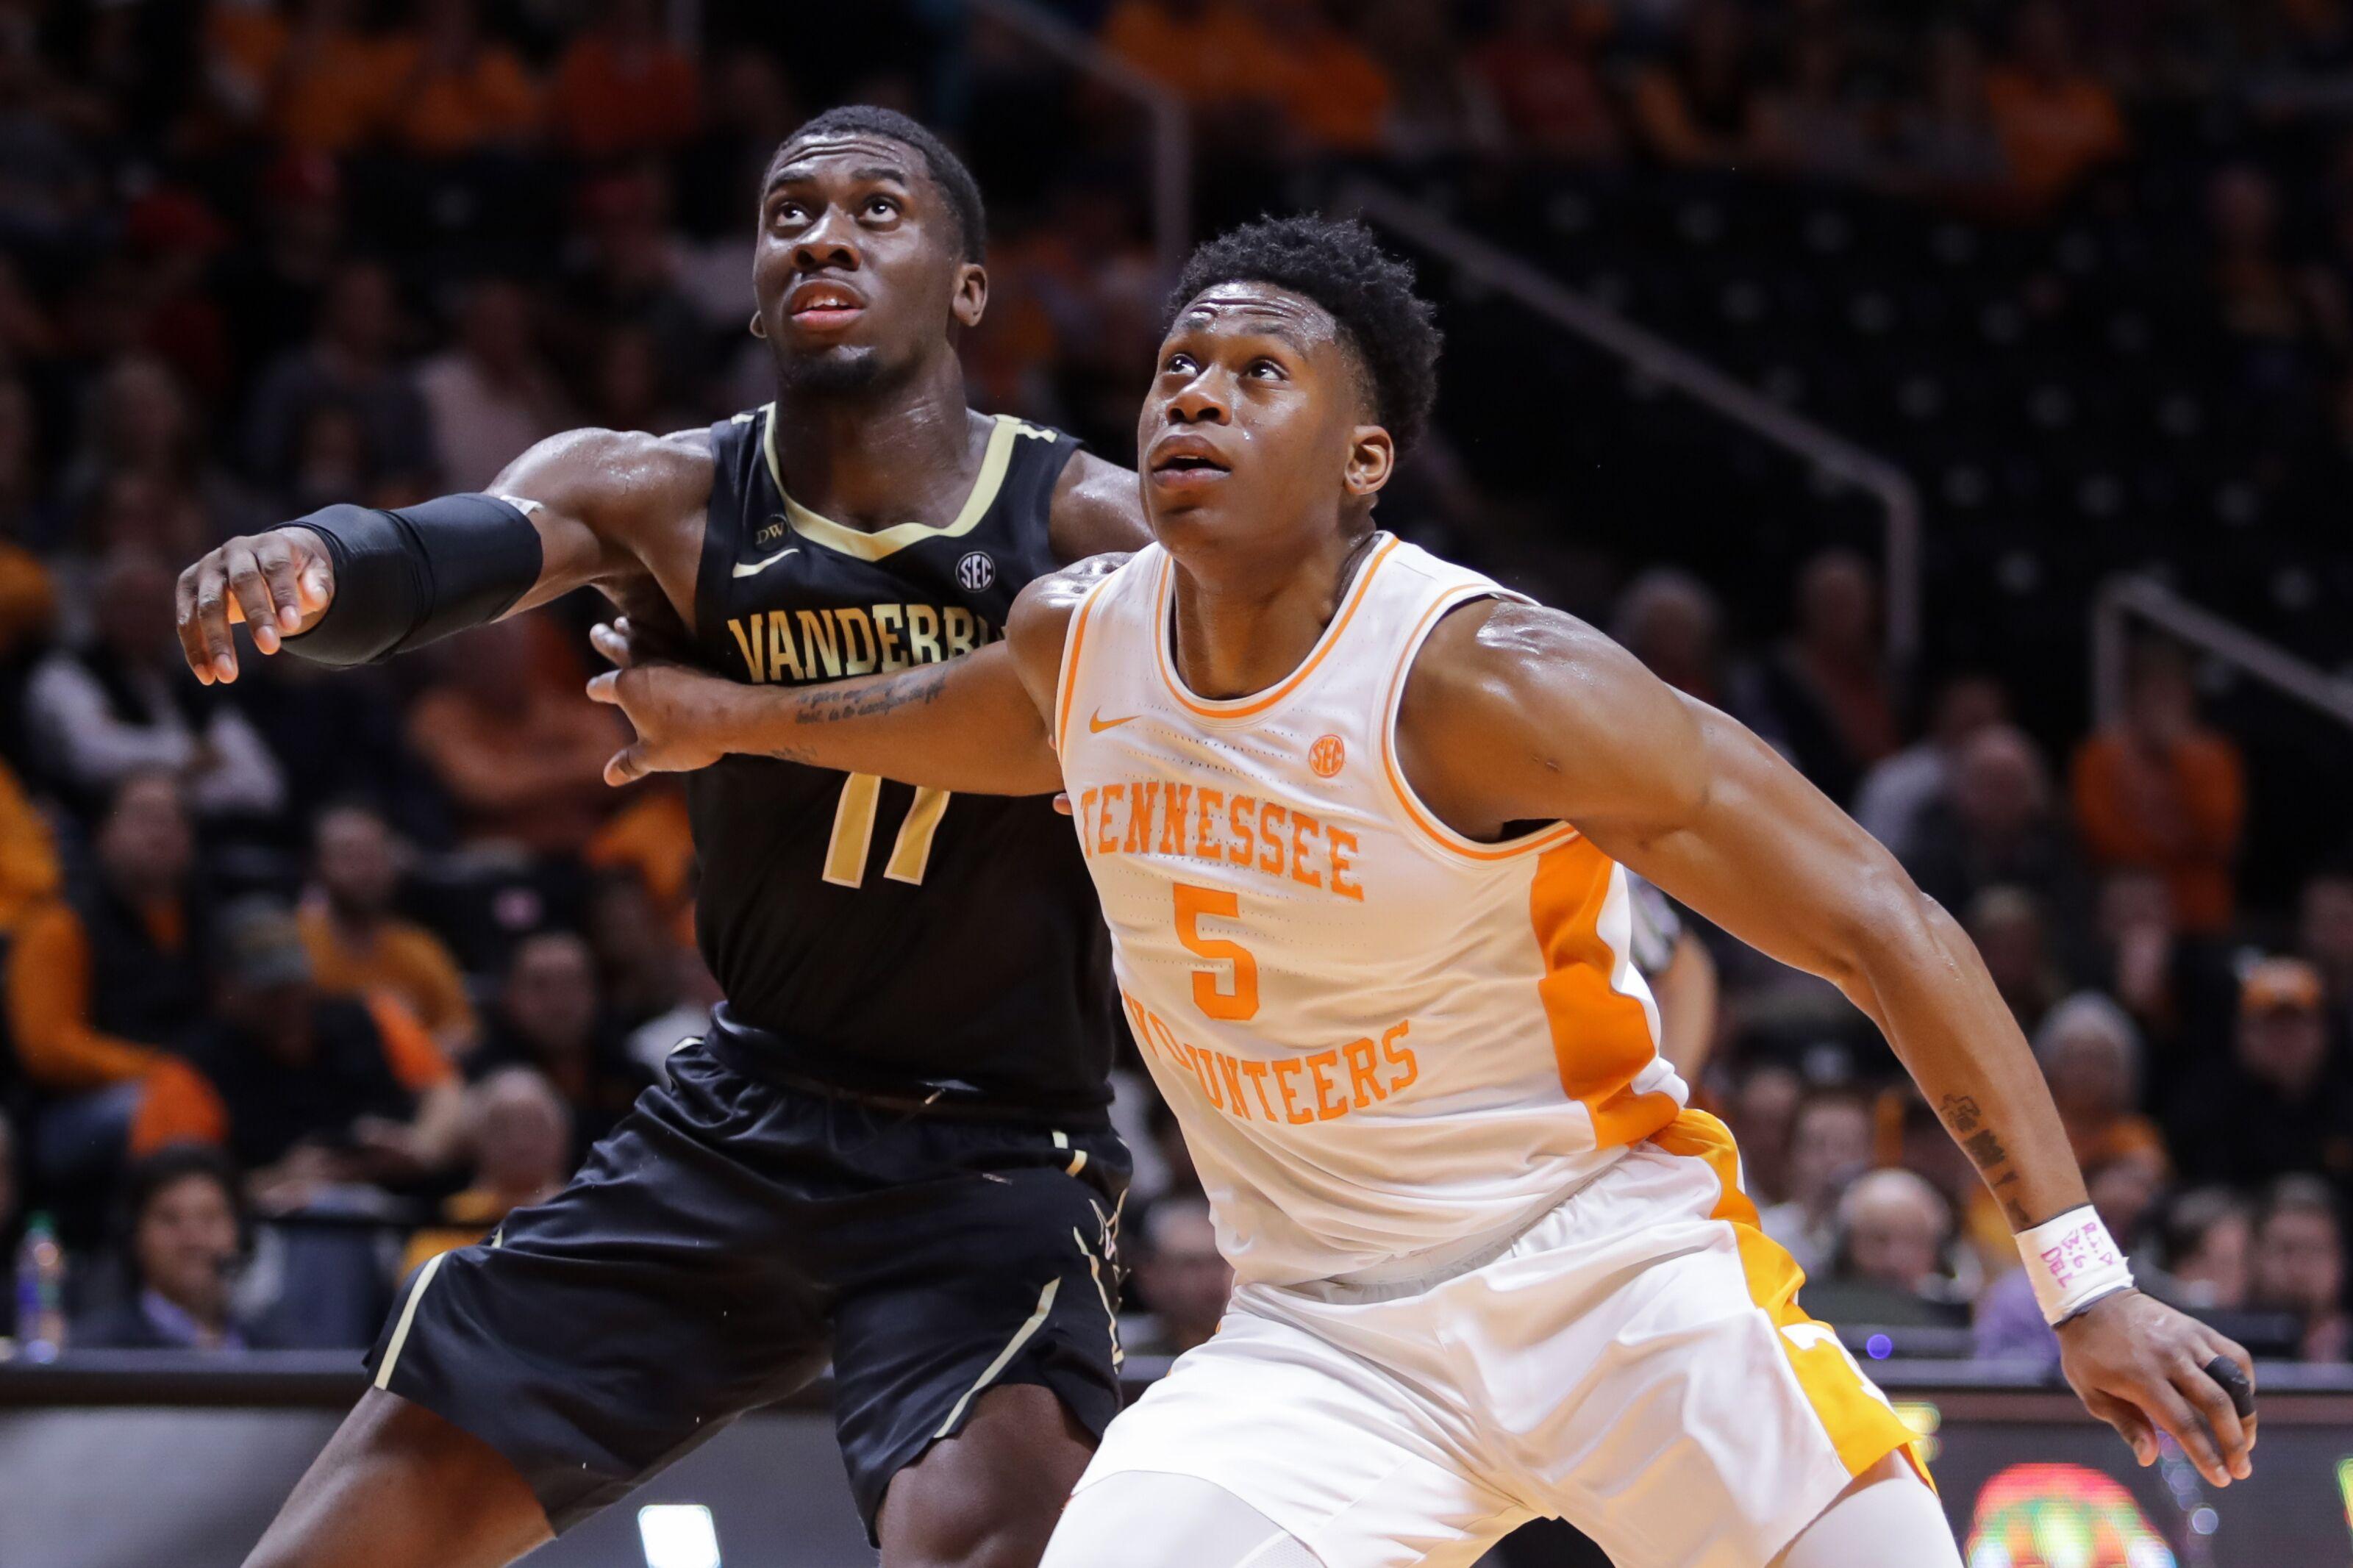 Tennessee basketball: How Kentucky, Duke and LSU developments affected Vols season Wednesday